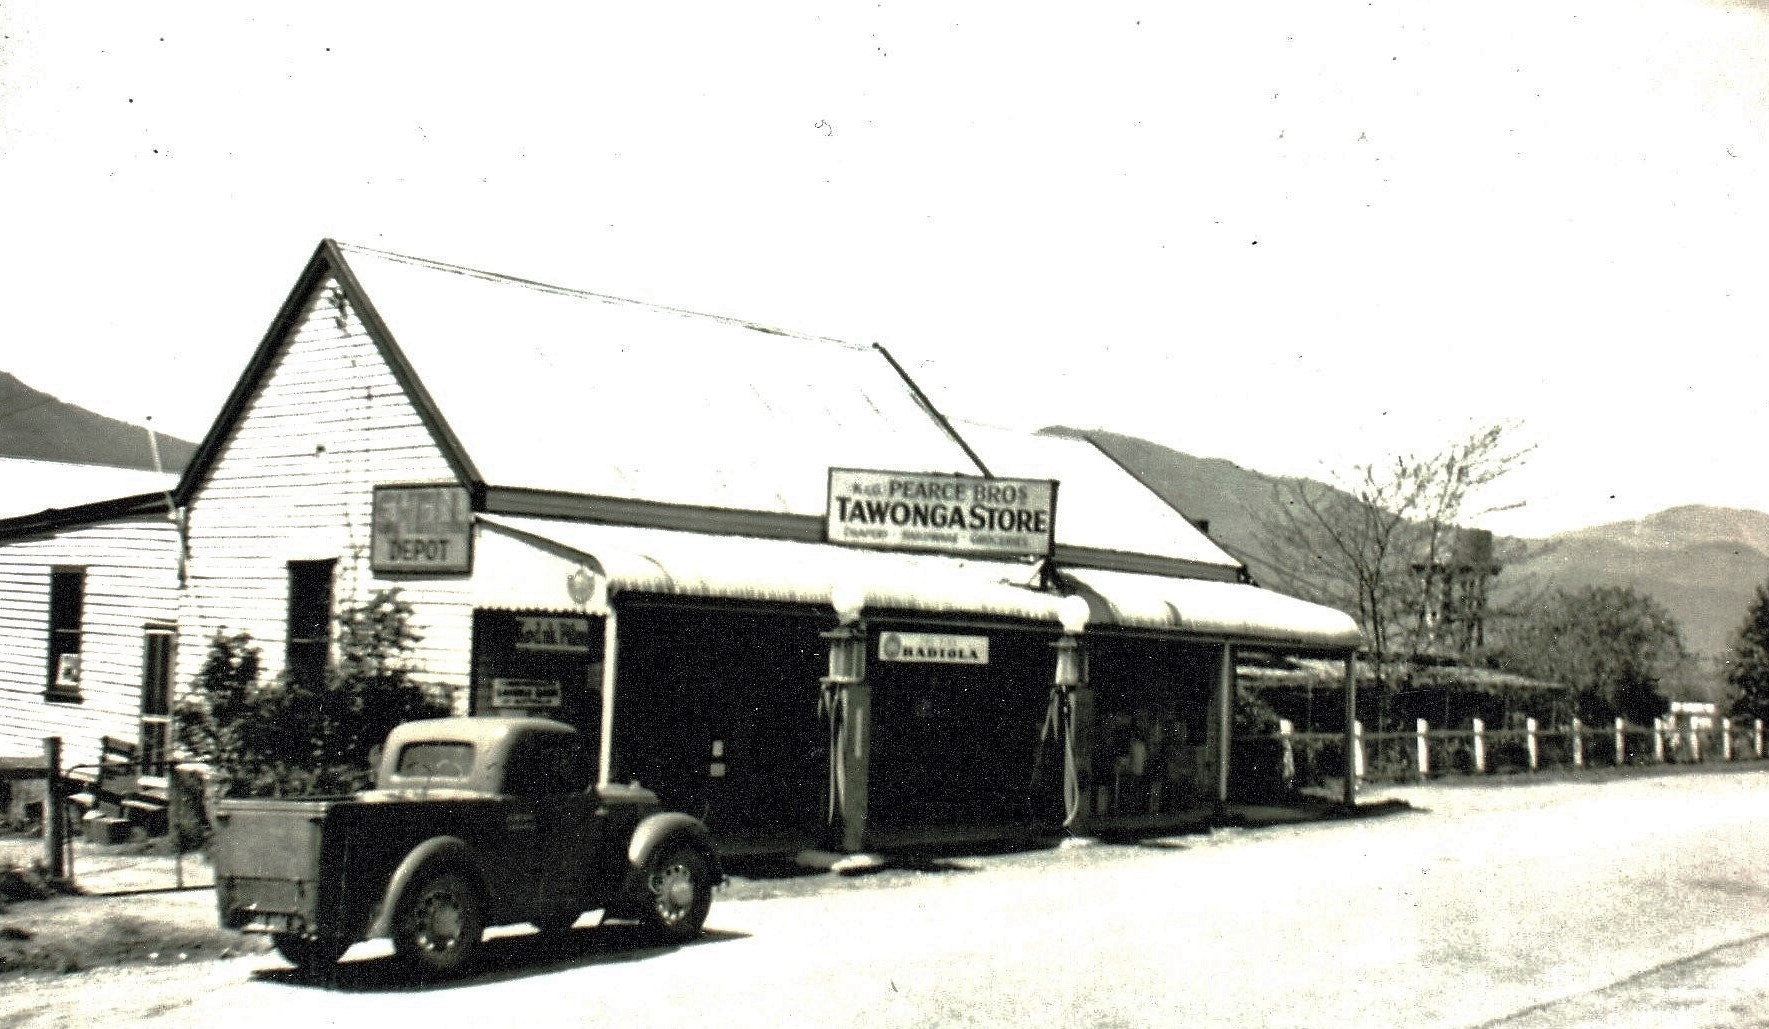 Pearce-Bros-Tawonga-Store